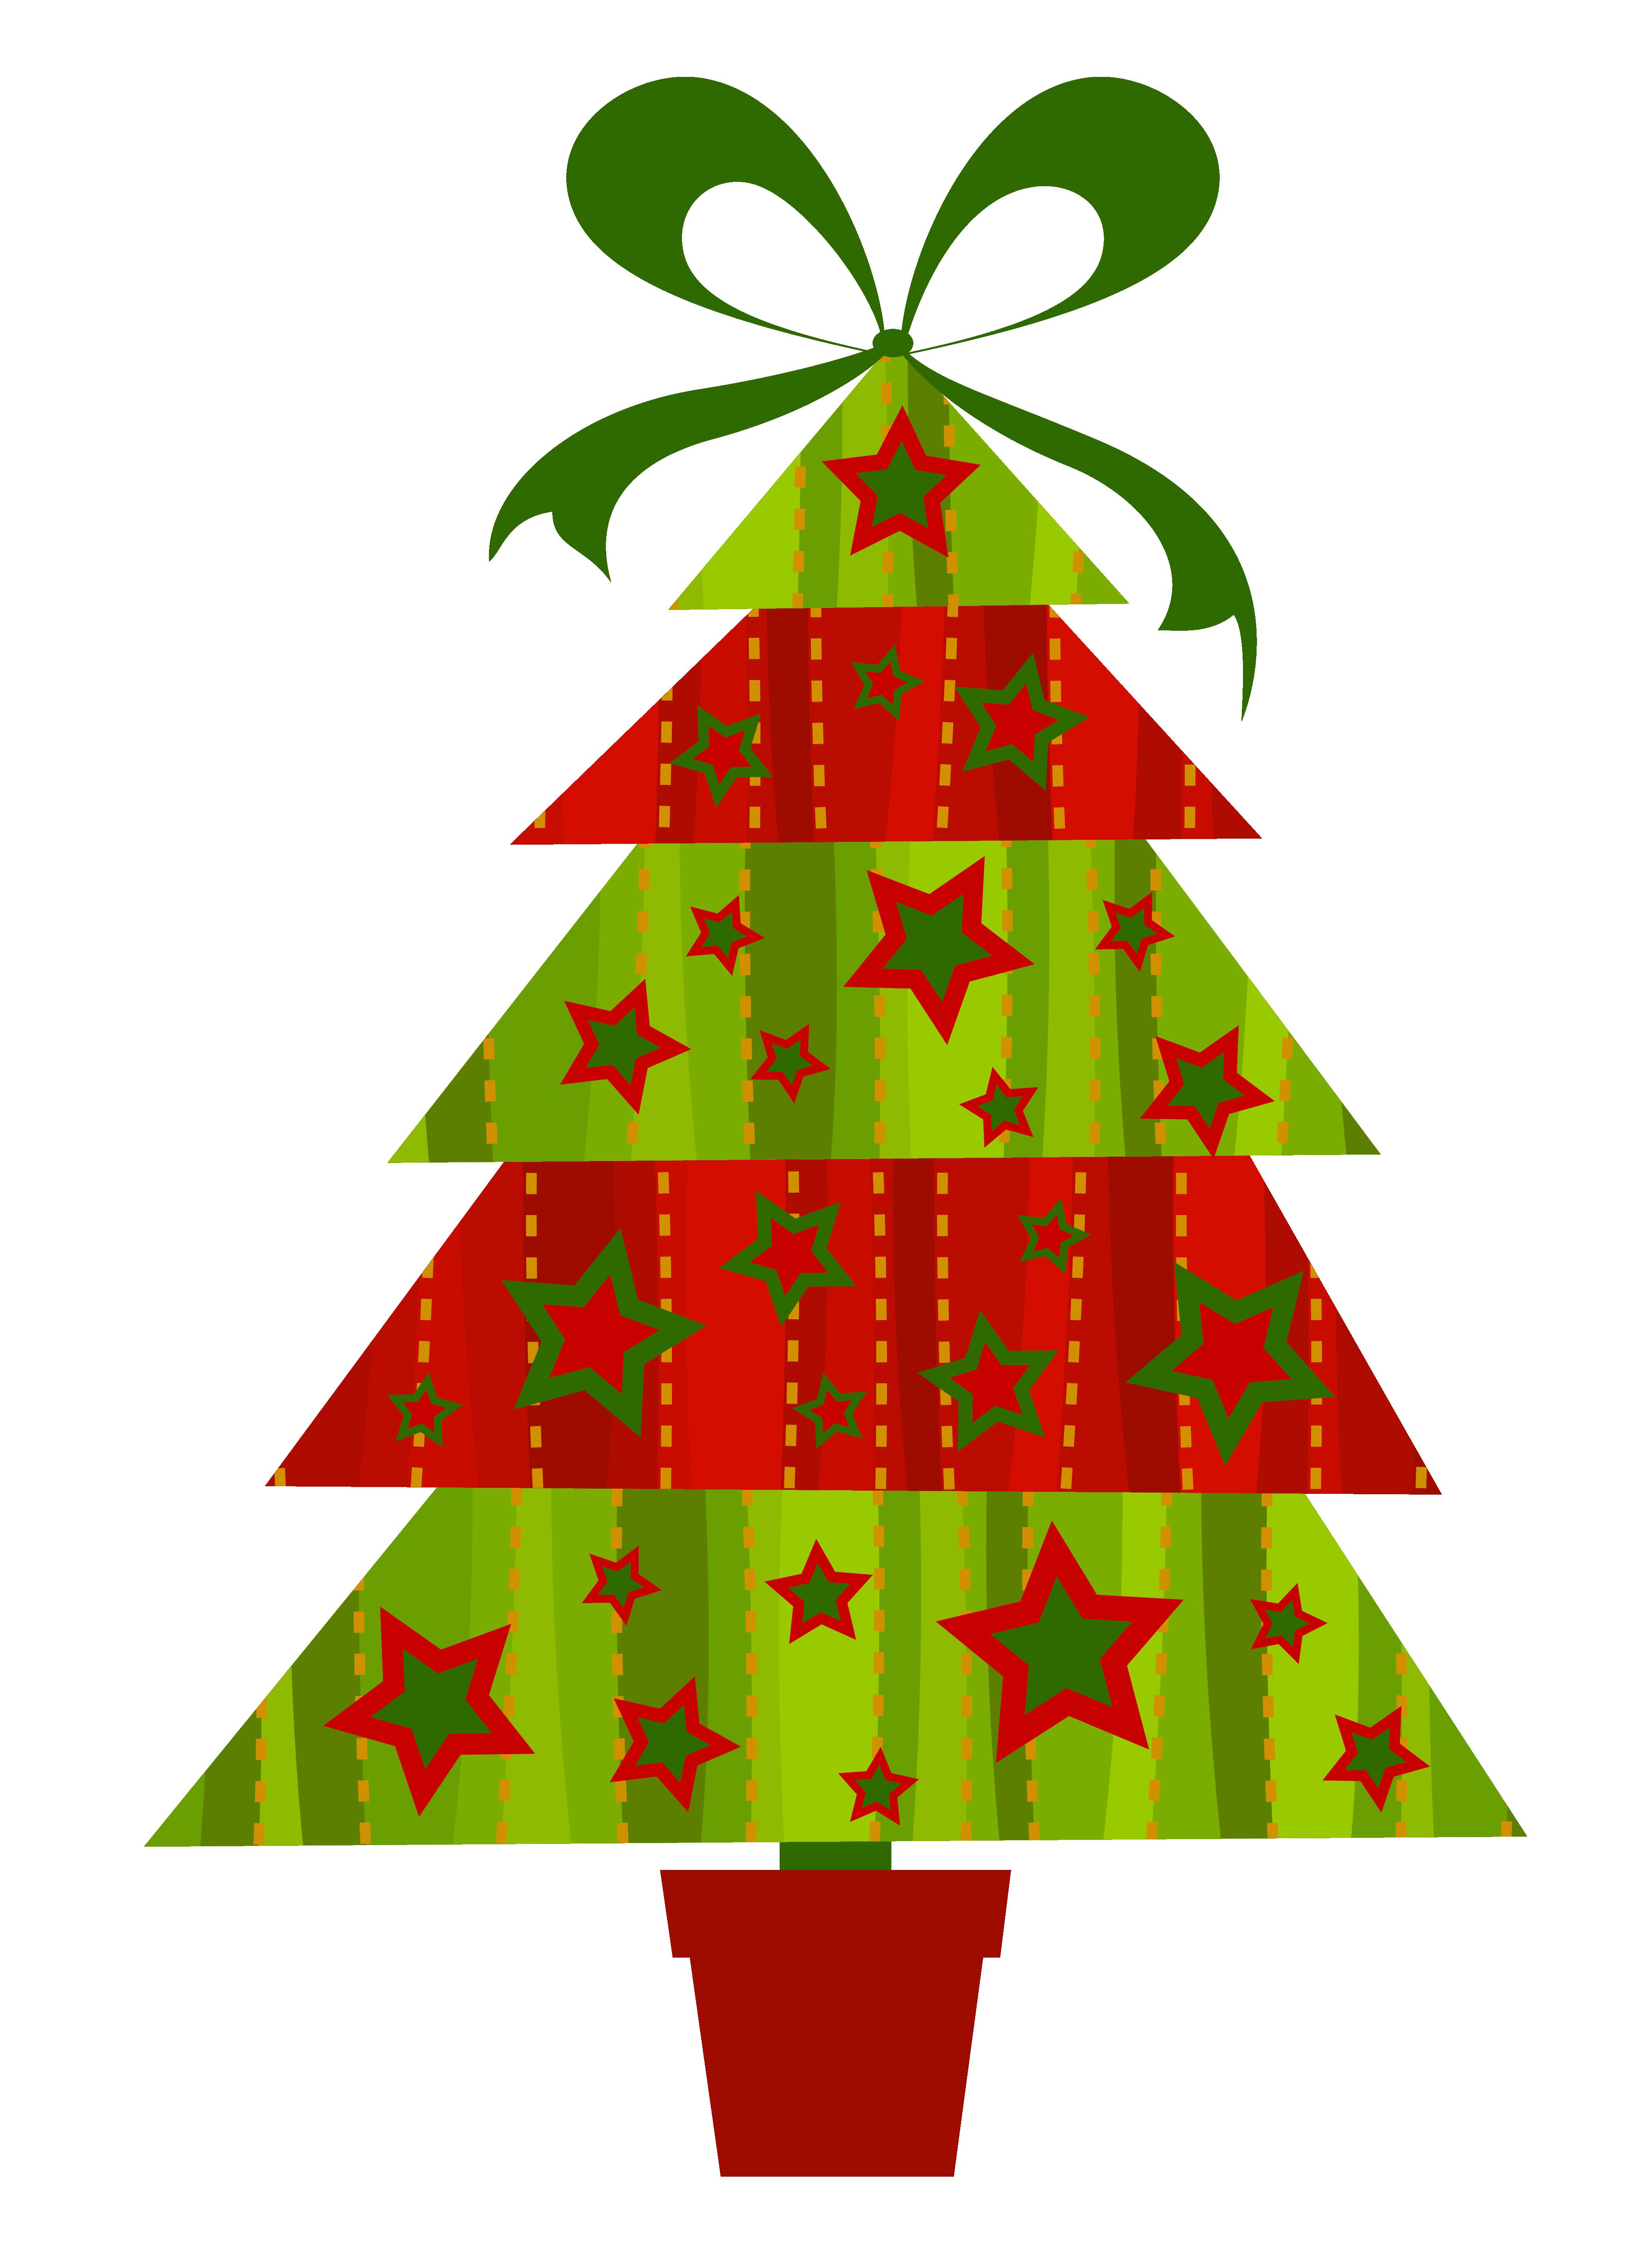 Christmas tree graphics clipart jpg stock Free Christmas Tree Clip Art, Download Free Clip Art, Free Clip Art ... jpg stock